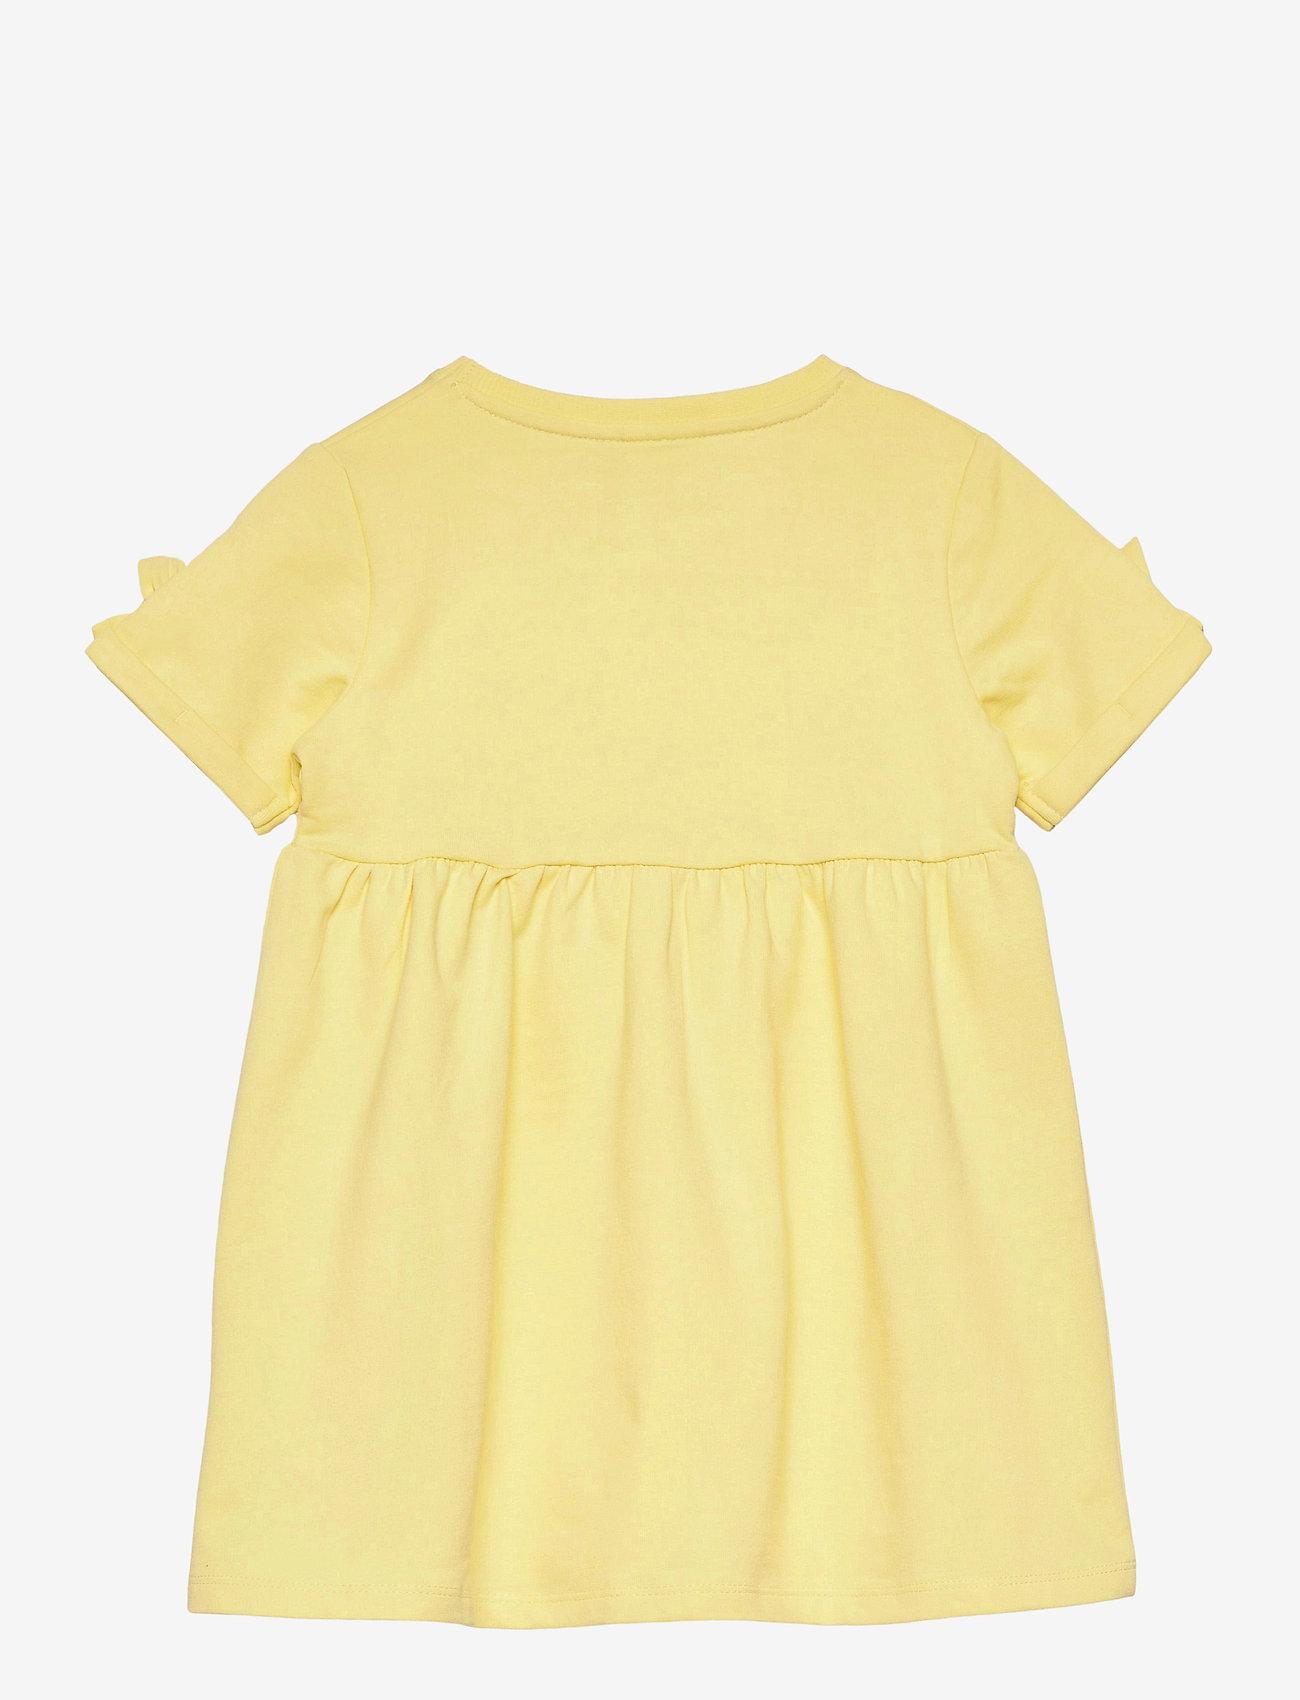 name it - NMFFARHANA LIGHT SWEAT DRESS UNB - kleider - yellow pear - 1